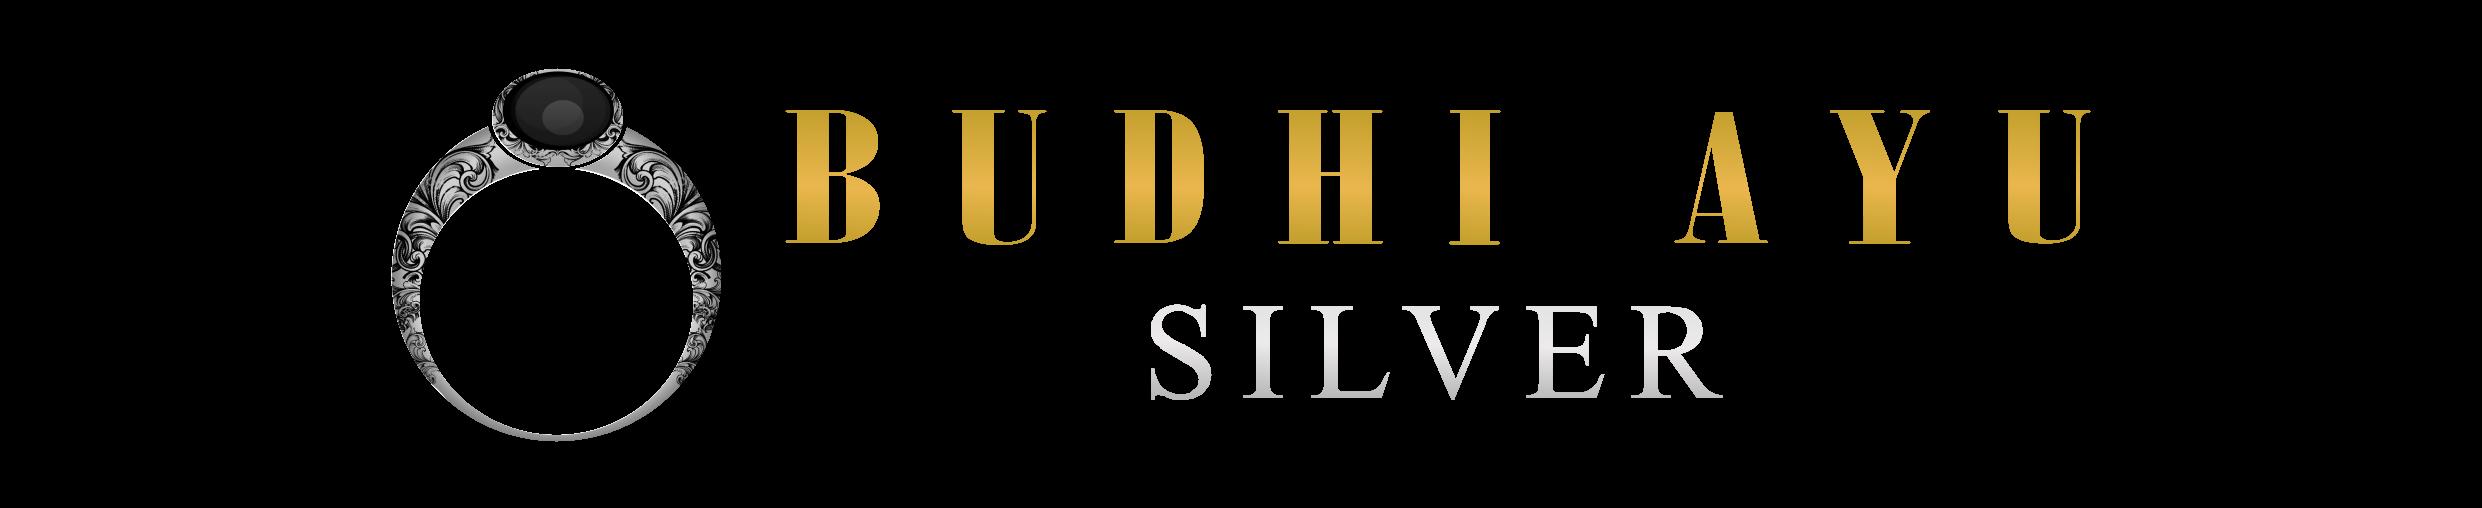 Budhi Ayu Art Shop